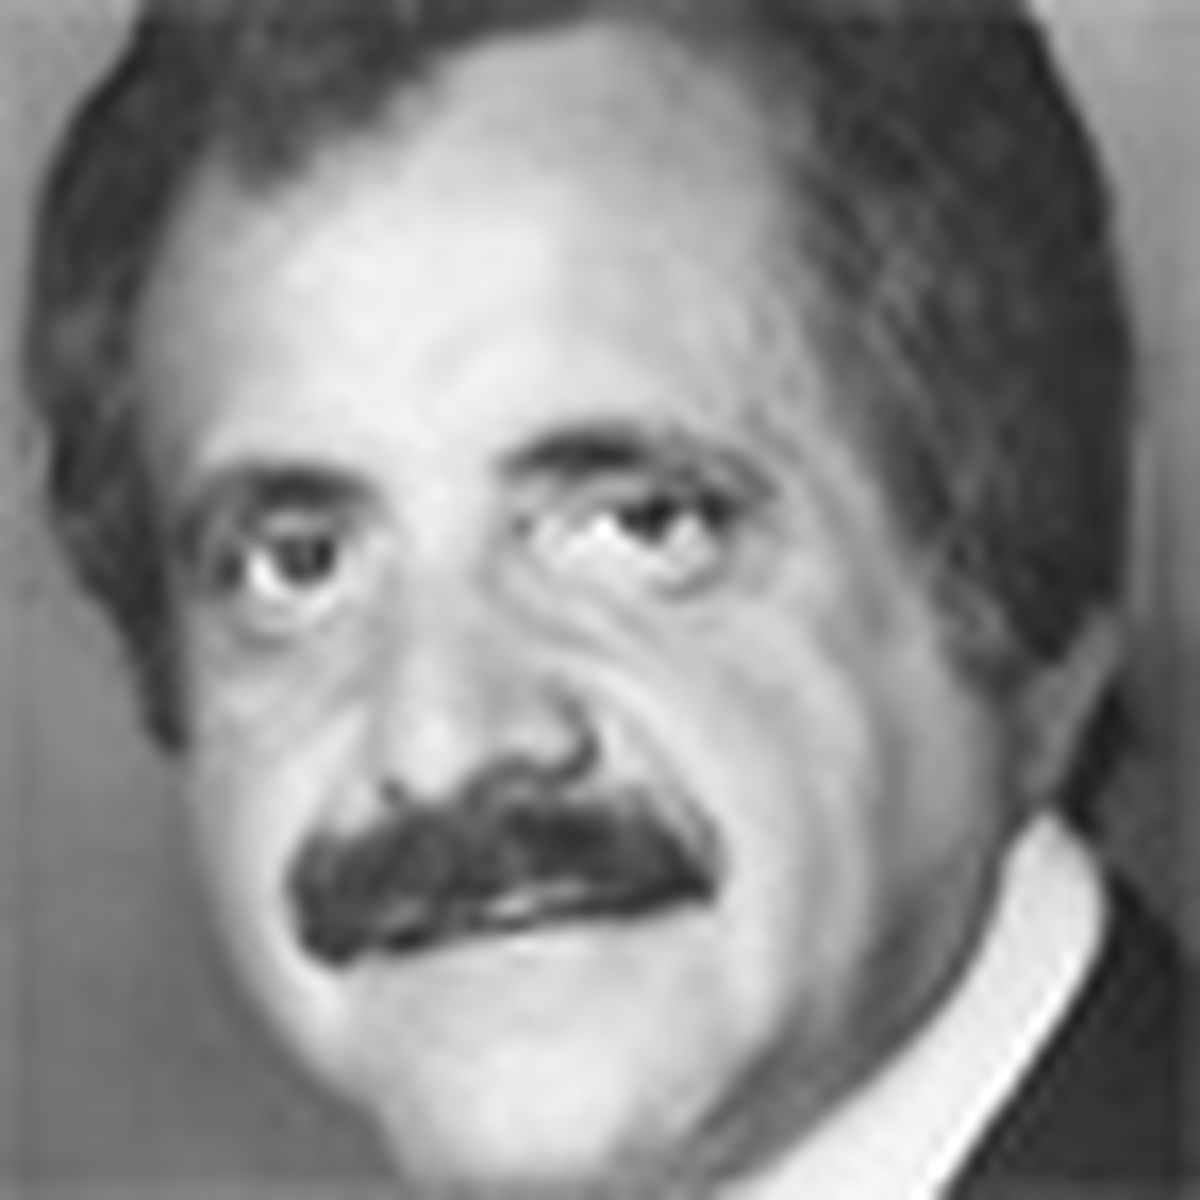 Bob Marcucci, 'Idolmaker' from Philly